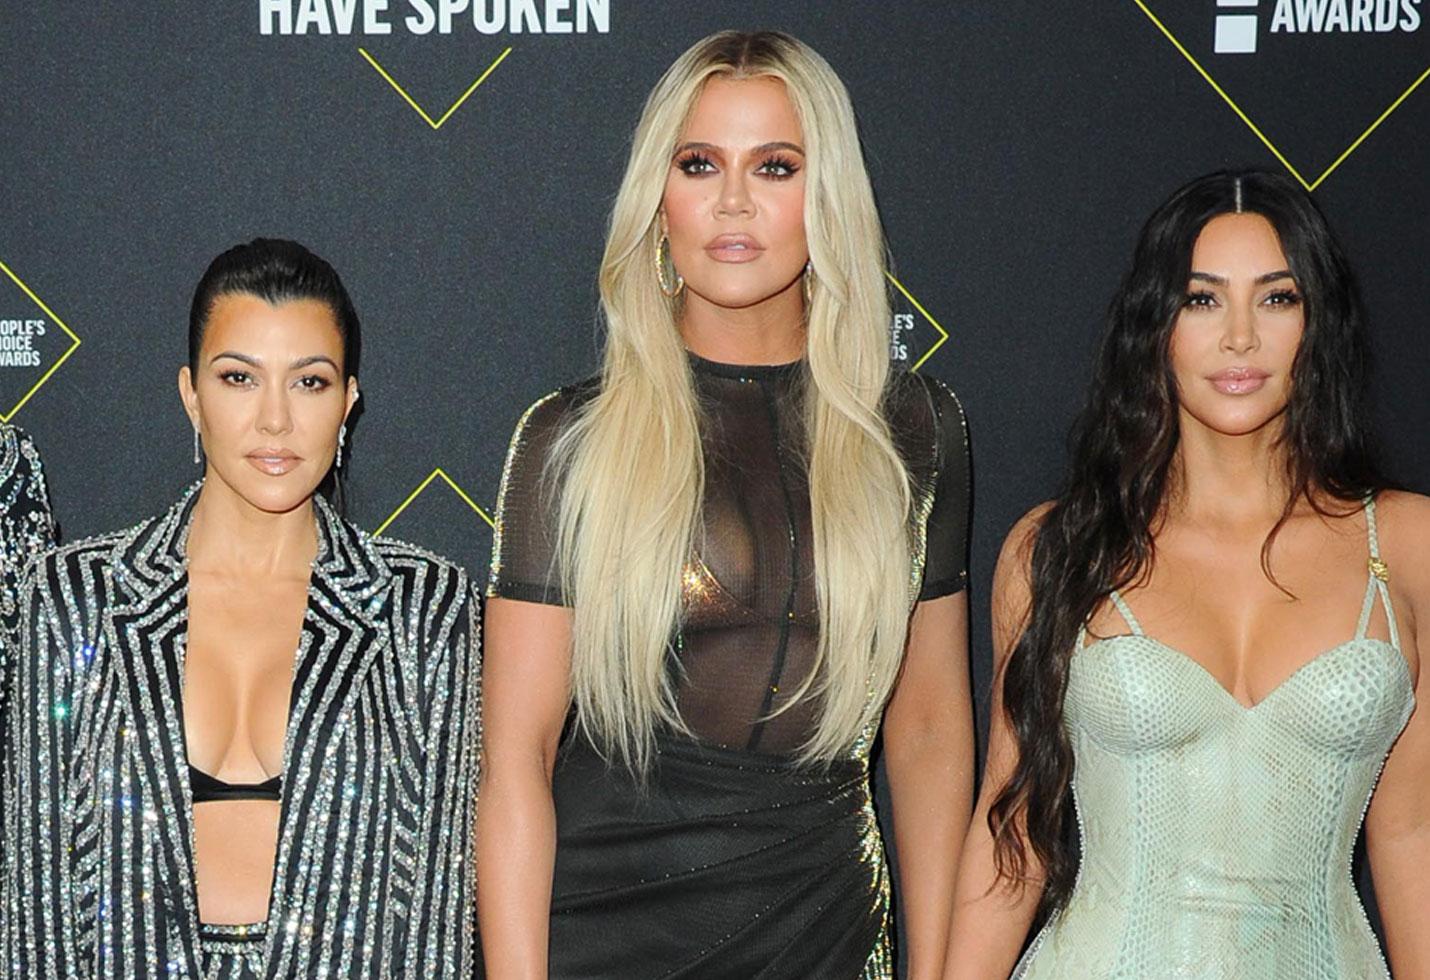 Kourtney Kardashian, Khloe Kardashian, Kim Kardashian West